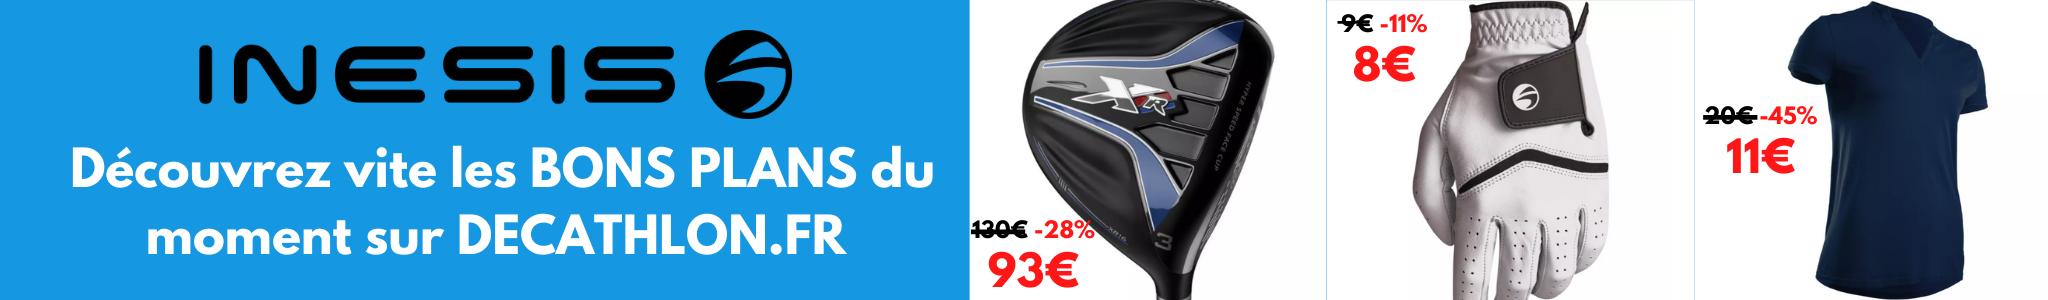 Les bons plans golf DECATHLON.fr